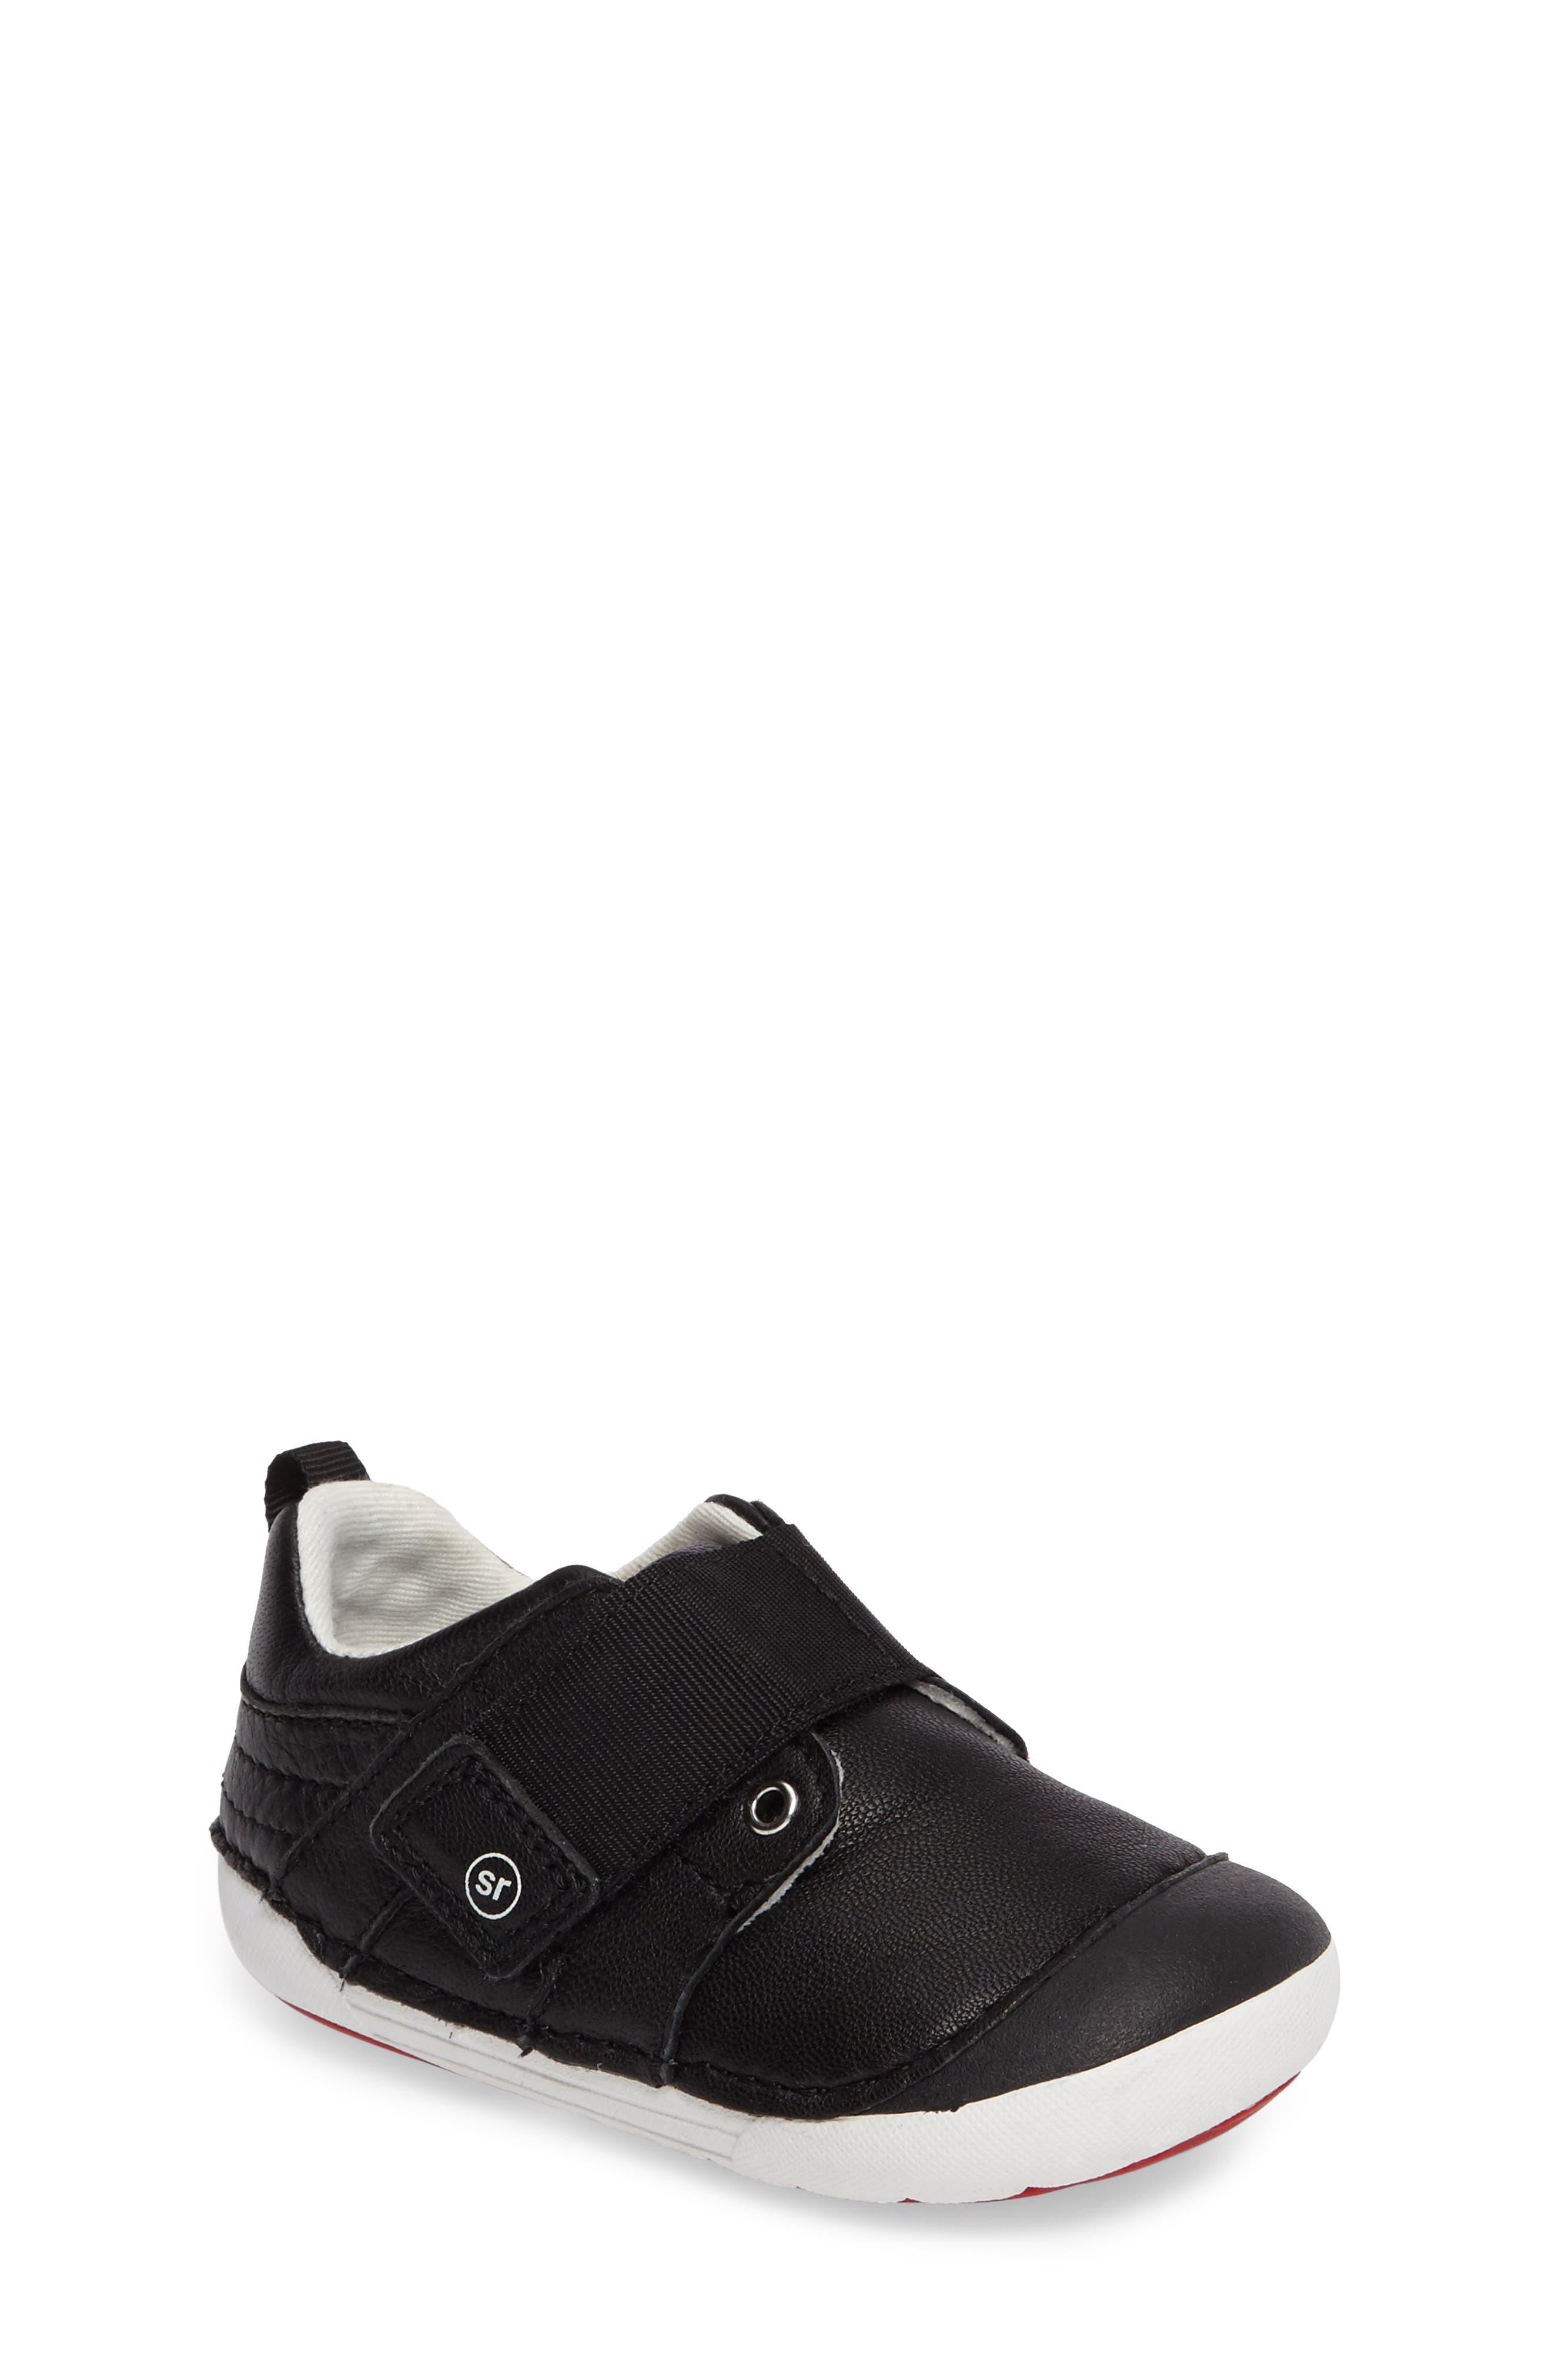 Stride Rite Soft Motion™ Cameron Sneaker (Baby & Walker)